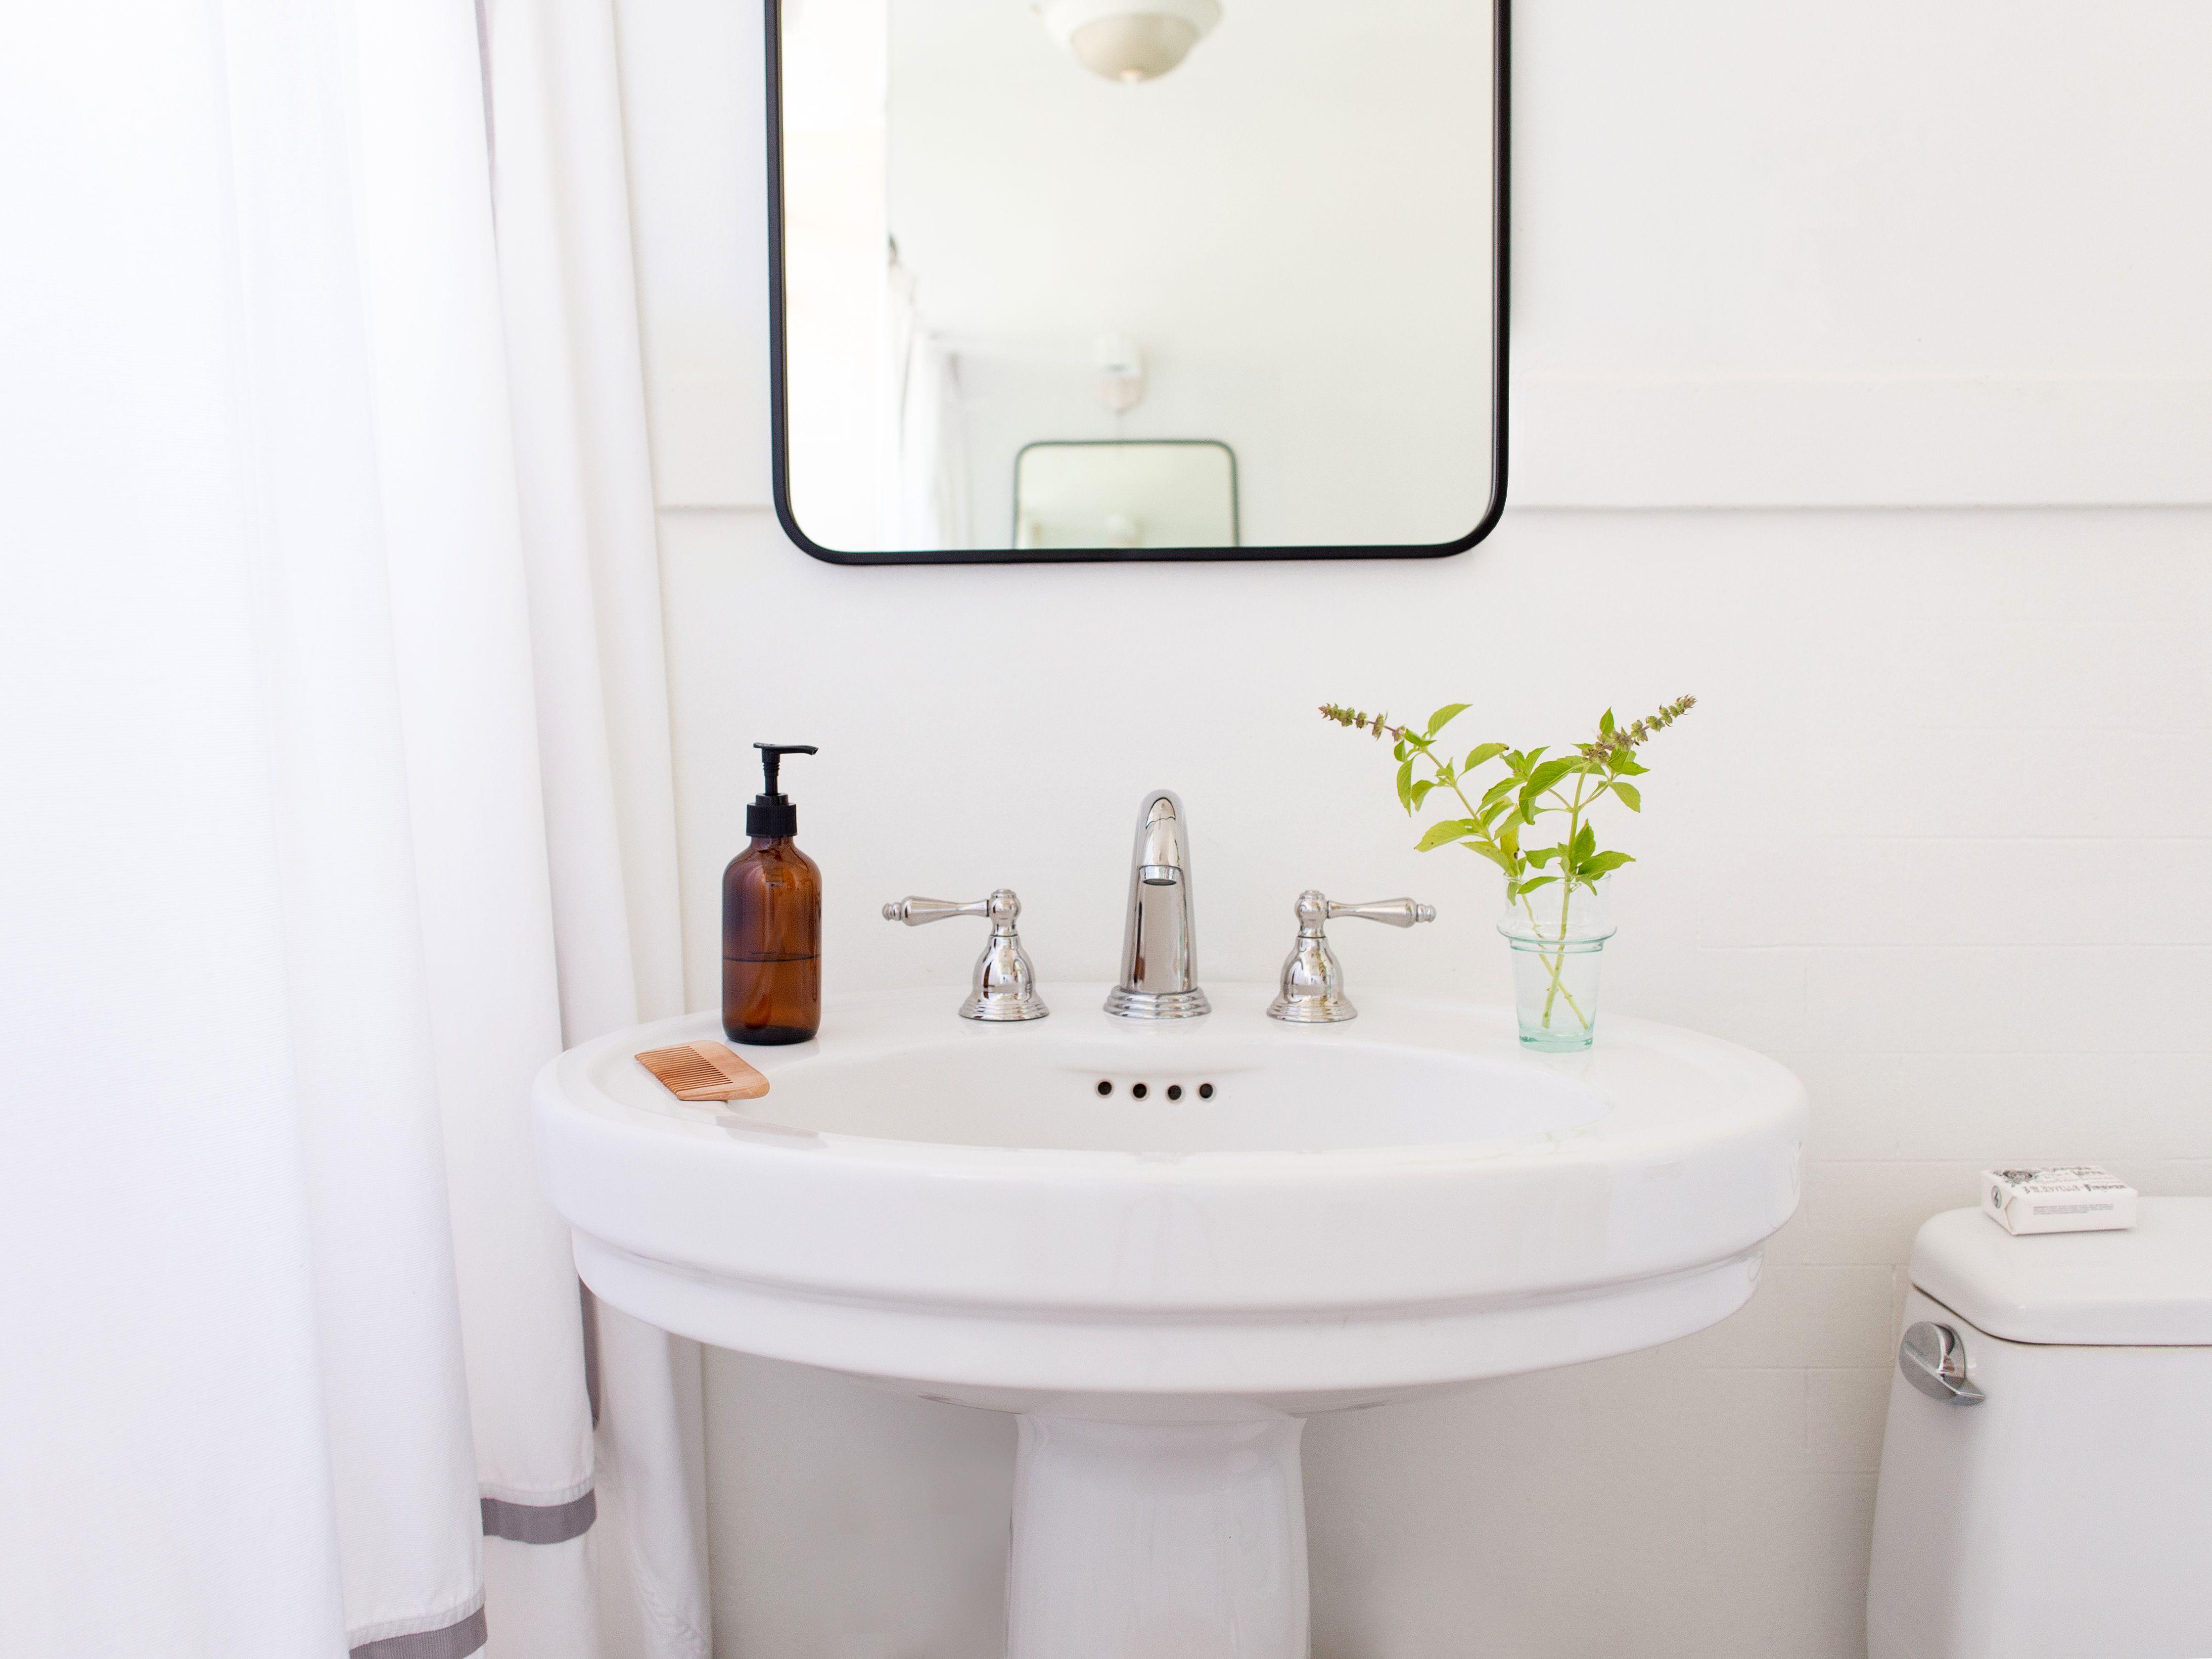 How To Make A Small Bathroom Look Bigger, Small Bathroom Appear Bigger